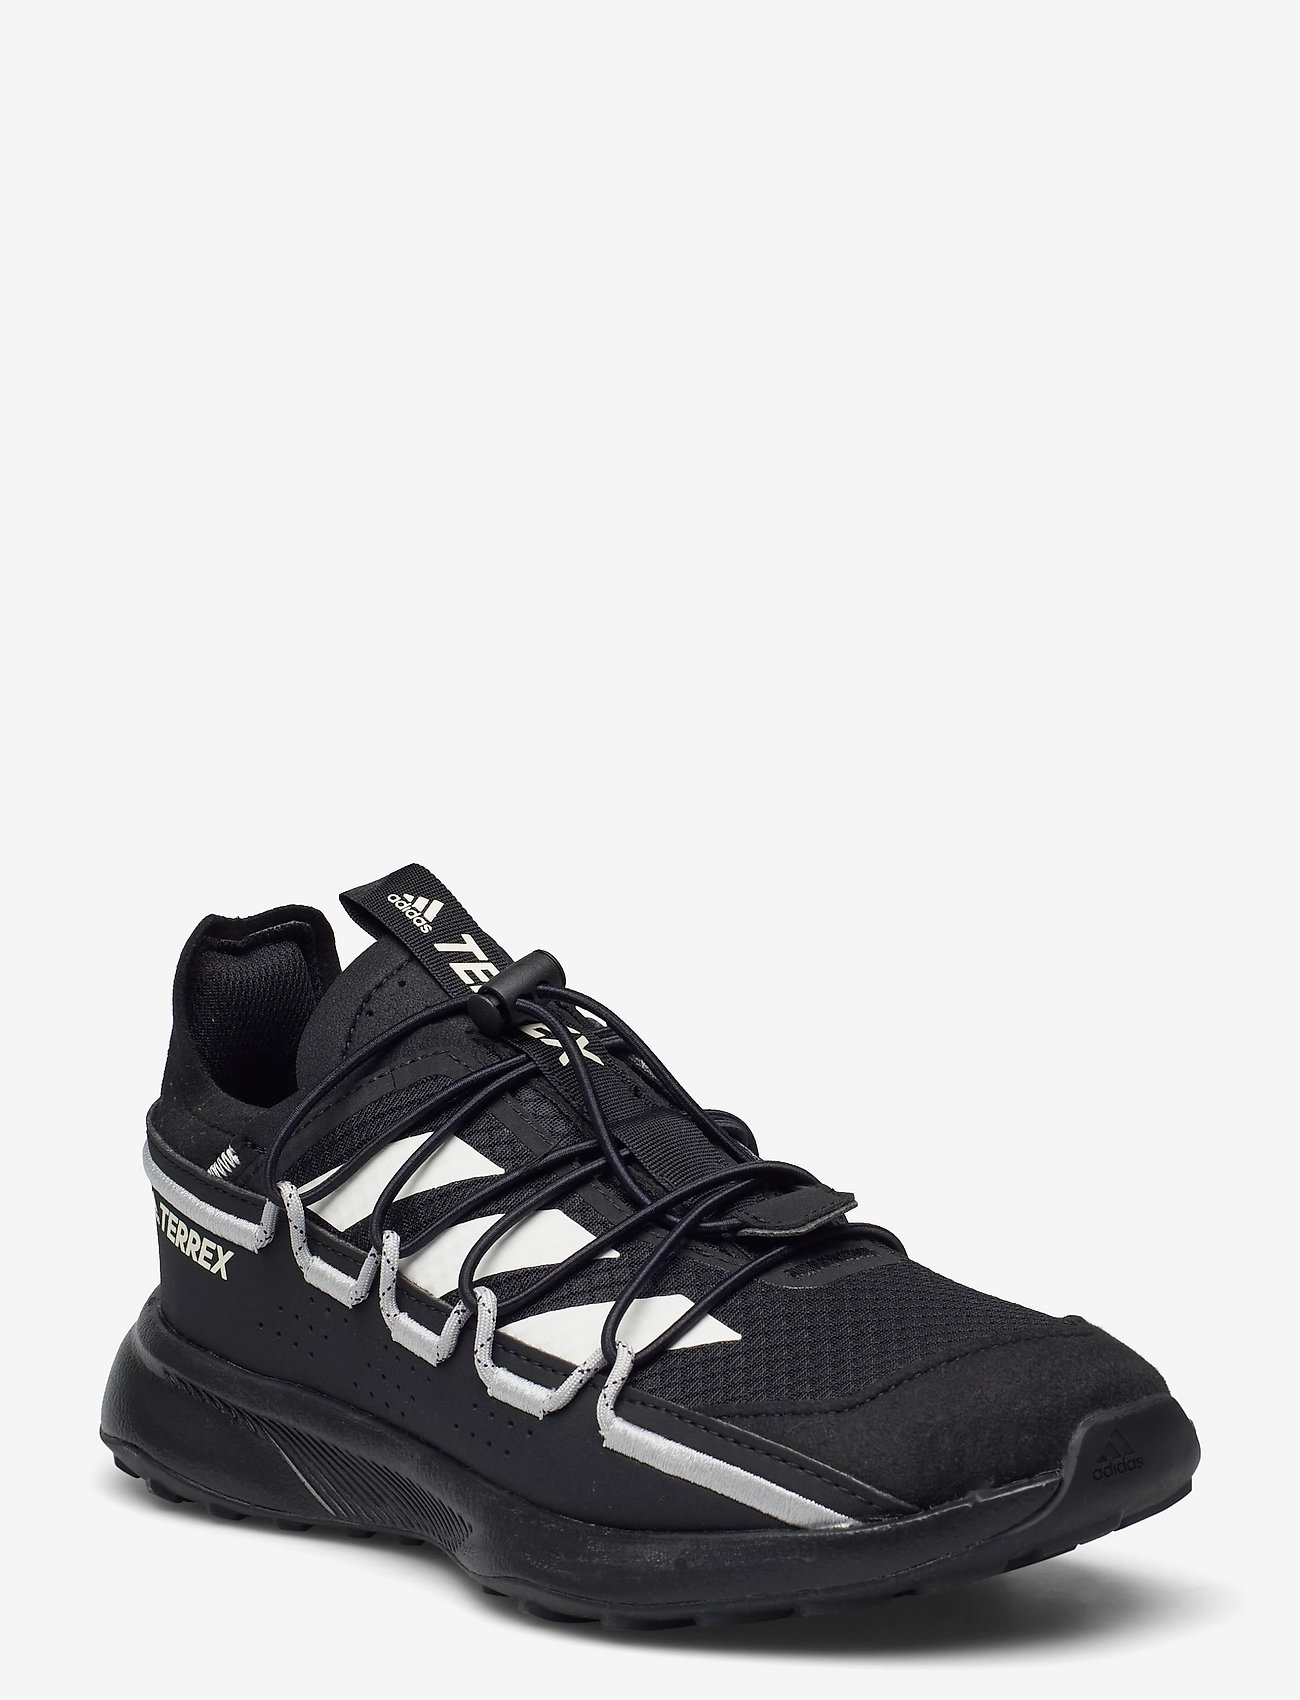 adidas Performance - Terrex Voyager 21 Travel - running shoes - cblack/cwhite/gretwo - 0